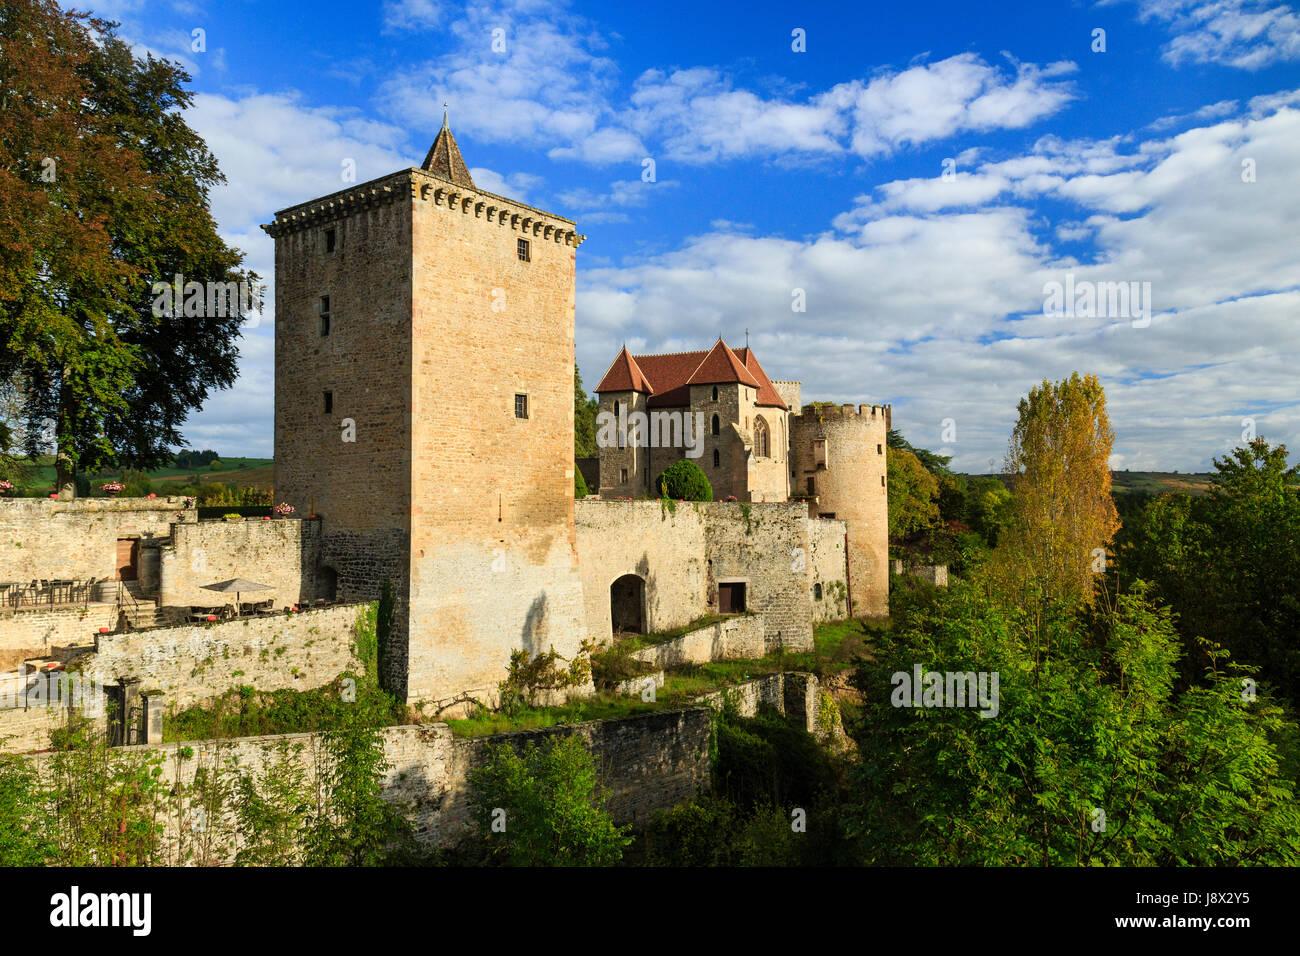 France, Saone et Loire, Couches, Couches castle - Stock Image